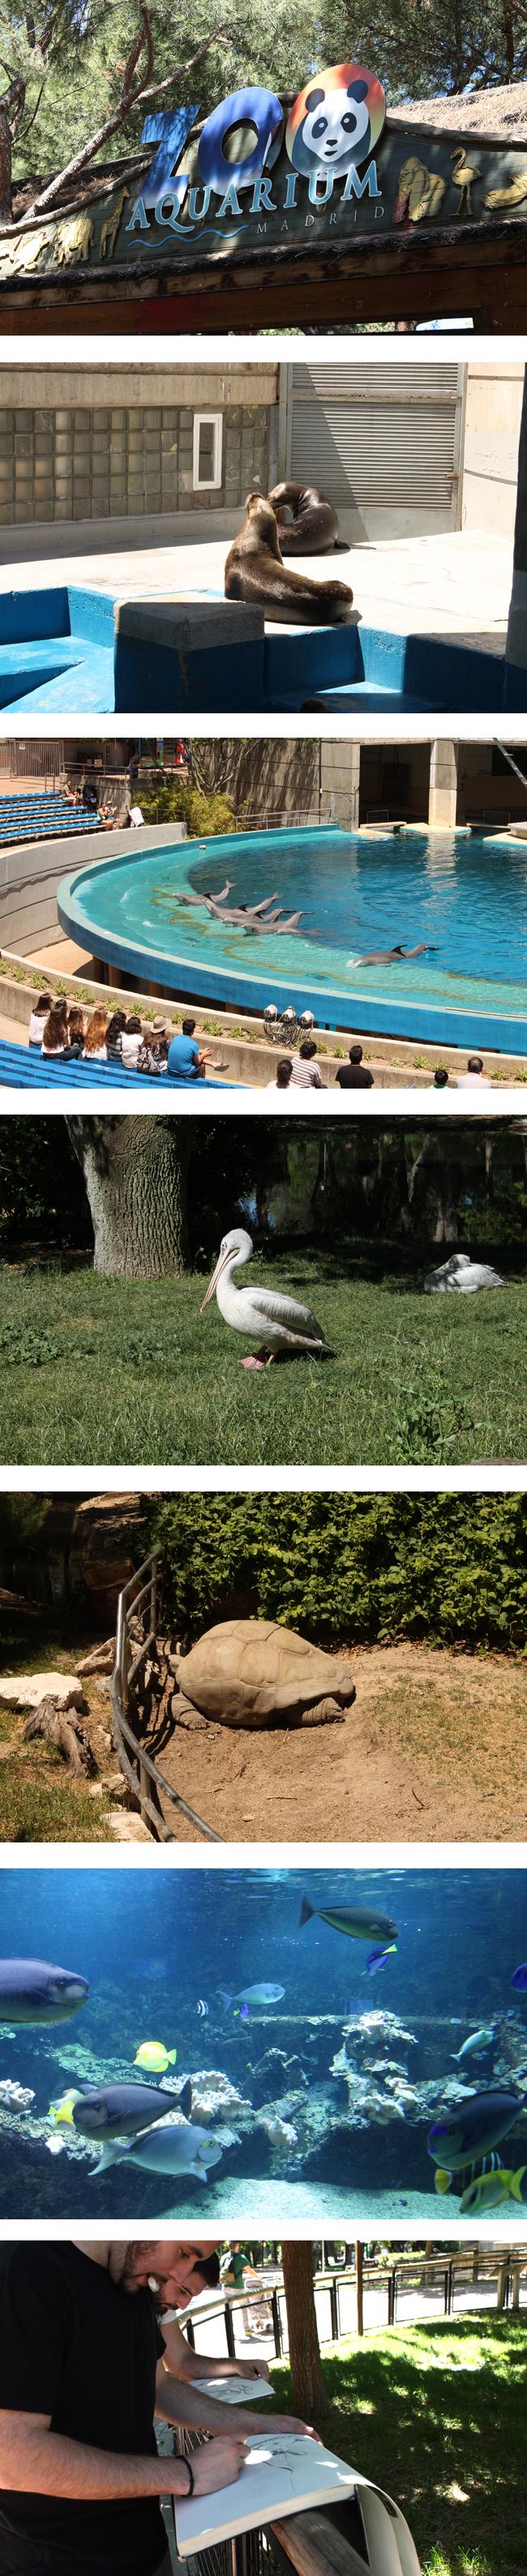 visita_zoo_madrid_alumnos_curso_master_artc10_ilustracion_mariano_saura_ana_pomares